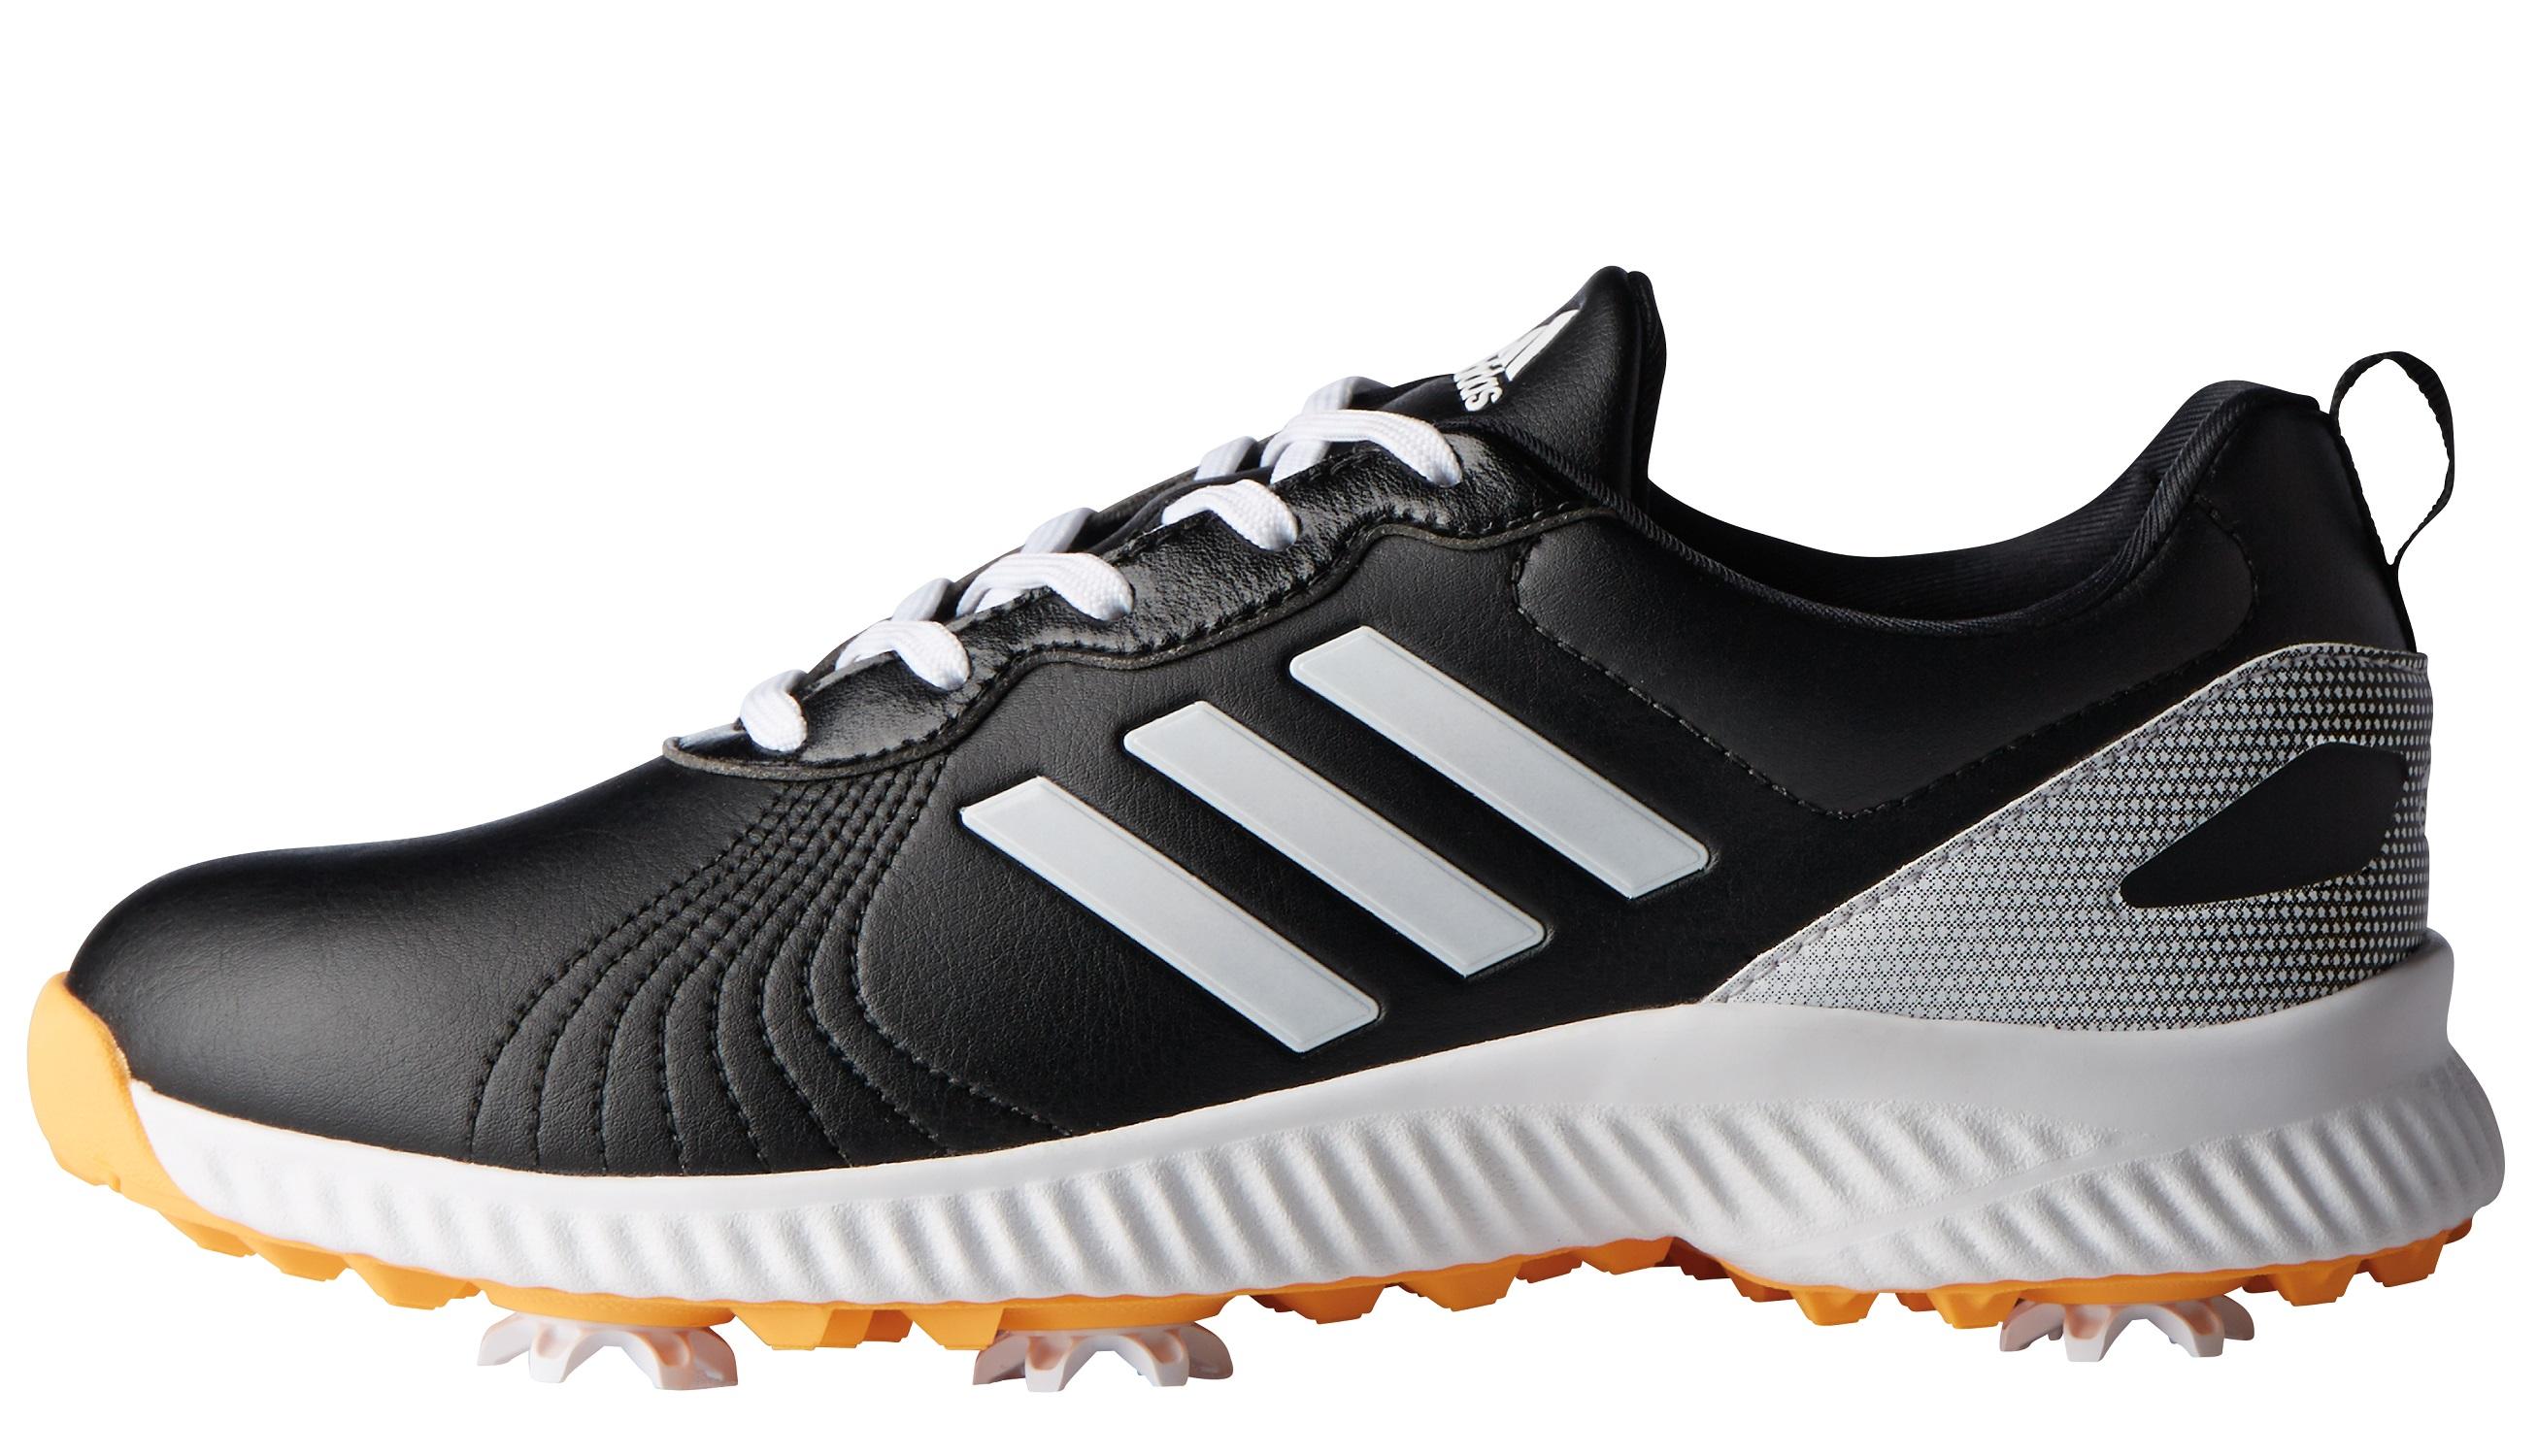 995ca54a41c81b Adidas Golf- Ladies Response Bounce Shoes